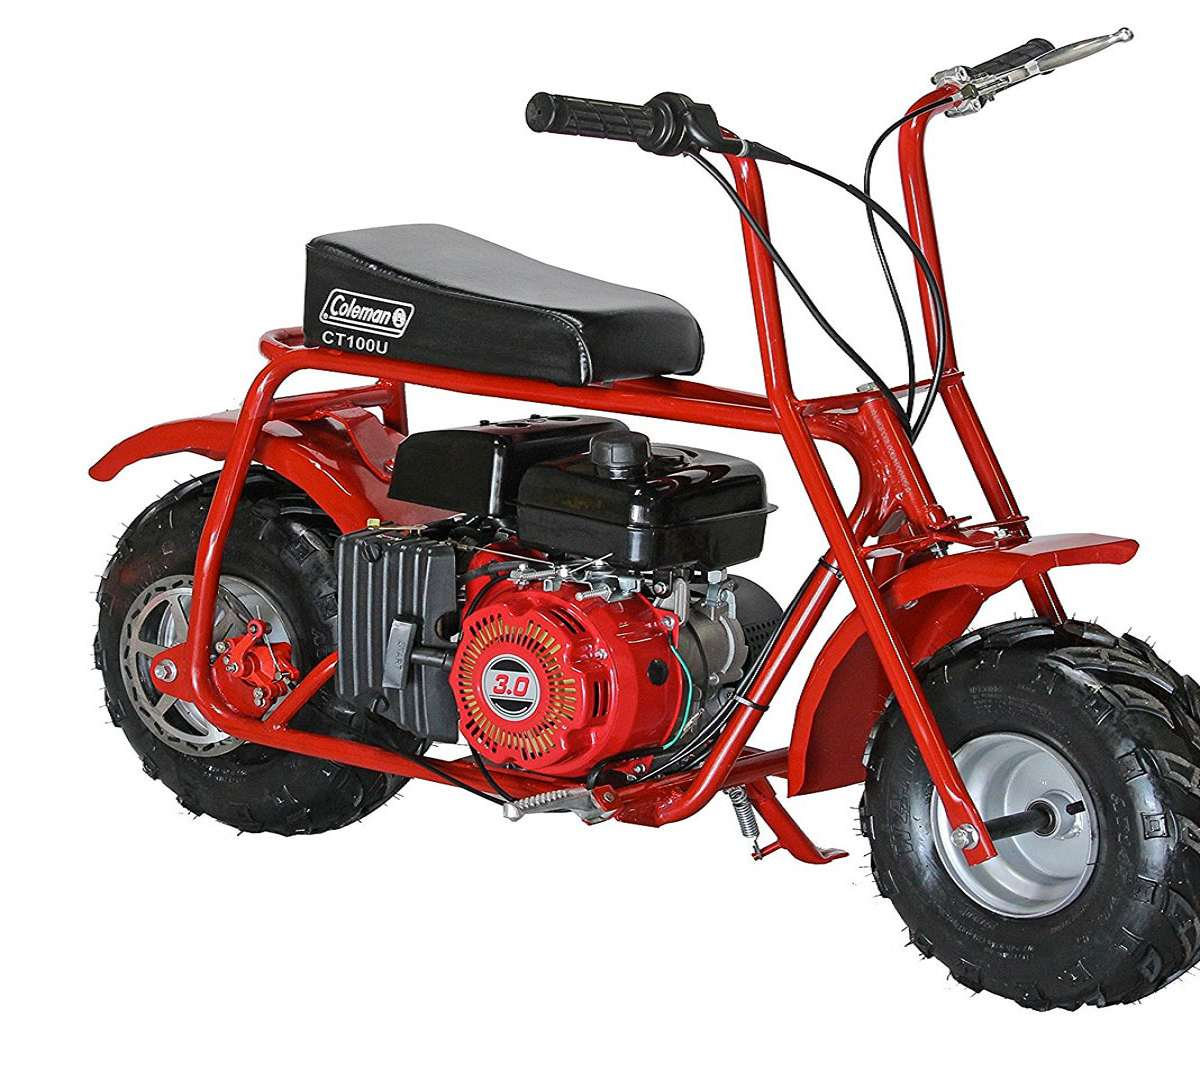 gas powered mini trail bike. Black Bedroom Furniture Sets. Home Design Ideas